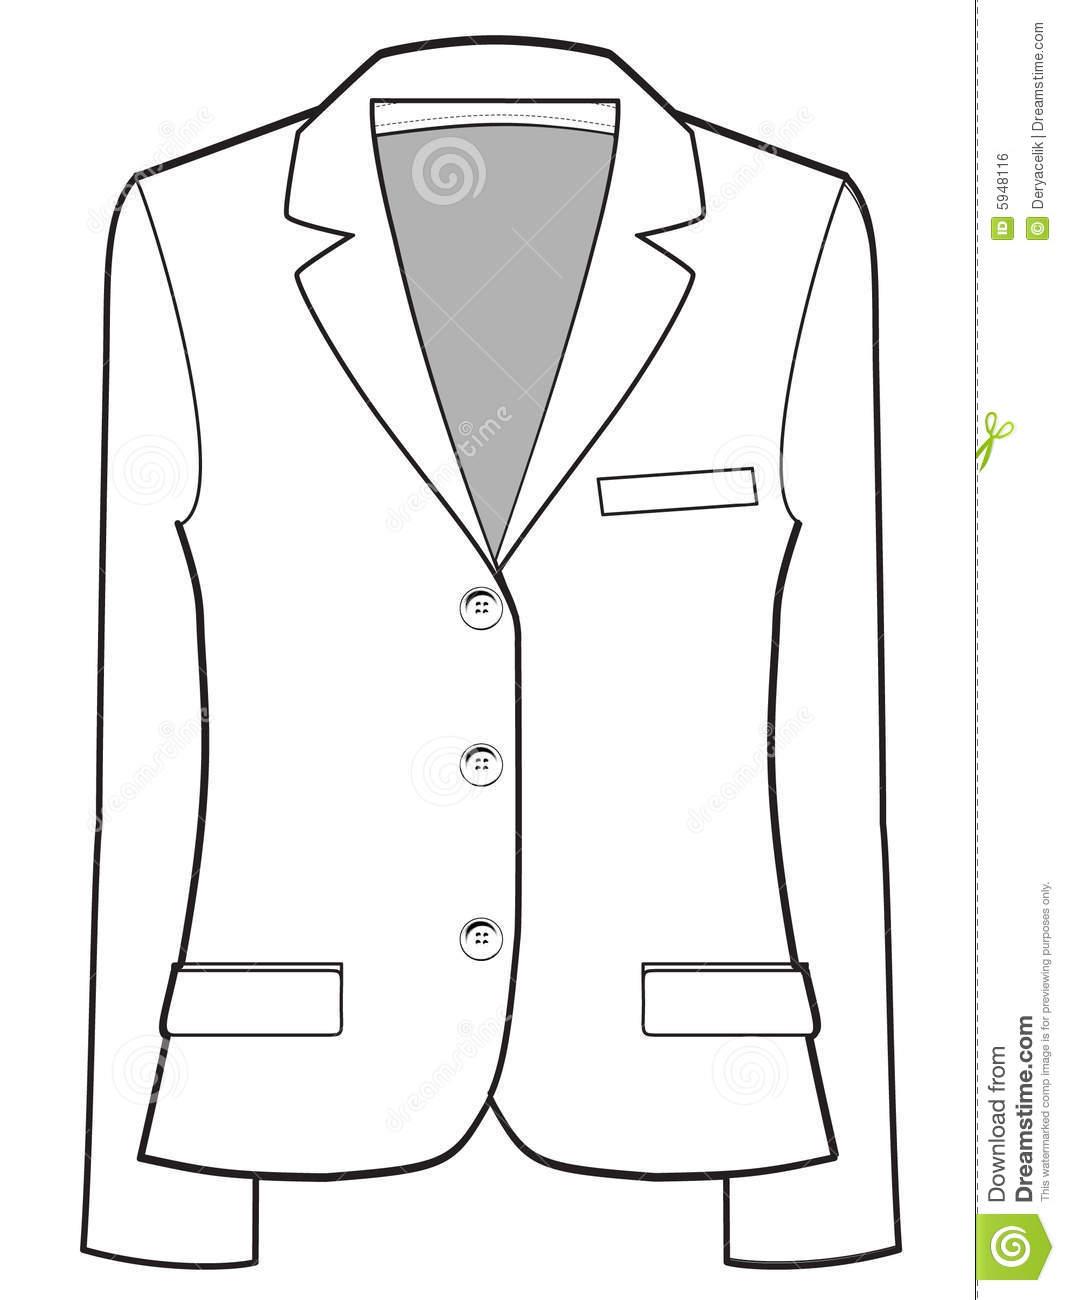 Clip Art Black And White Suit Clipart - Clipart Suggest